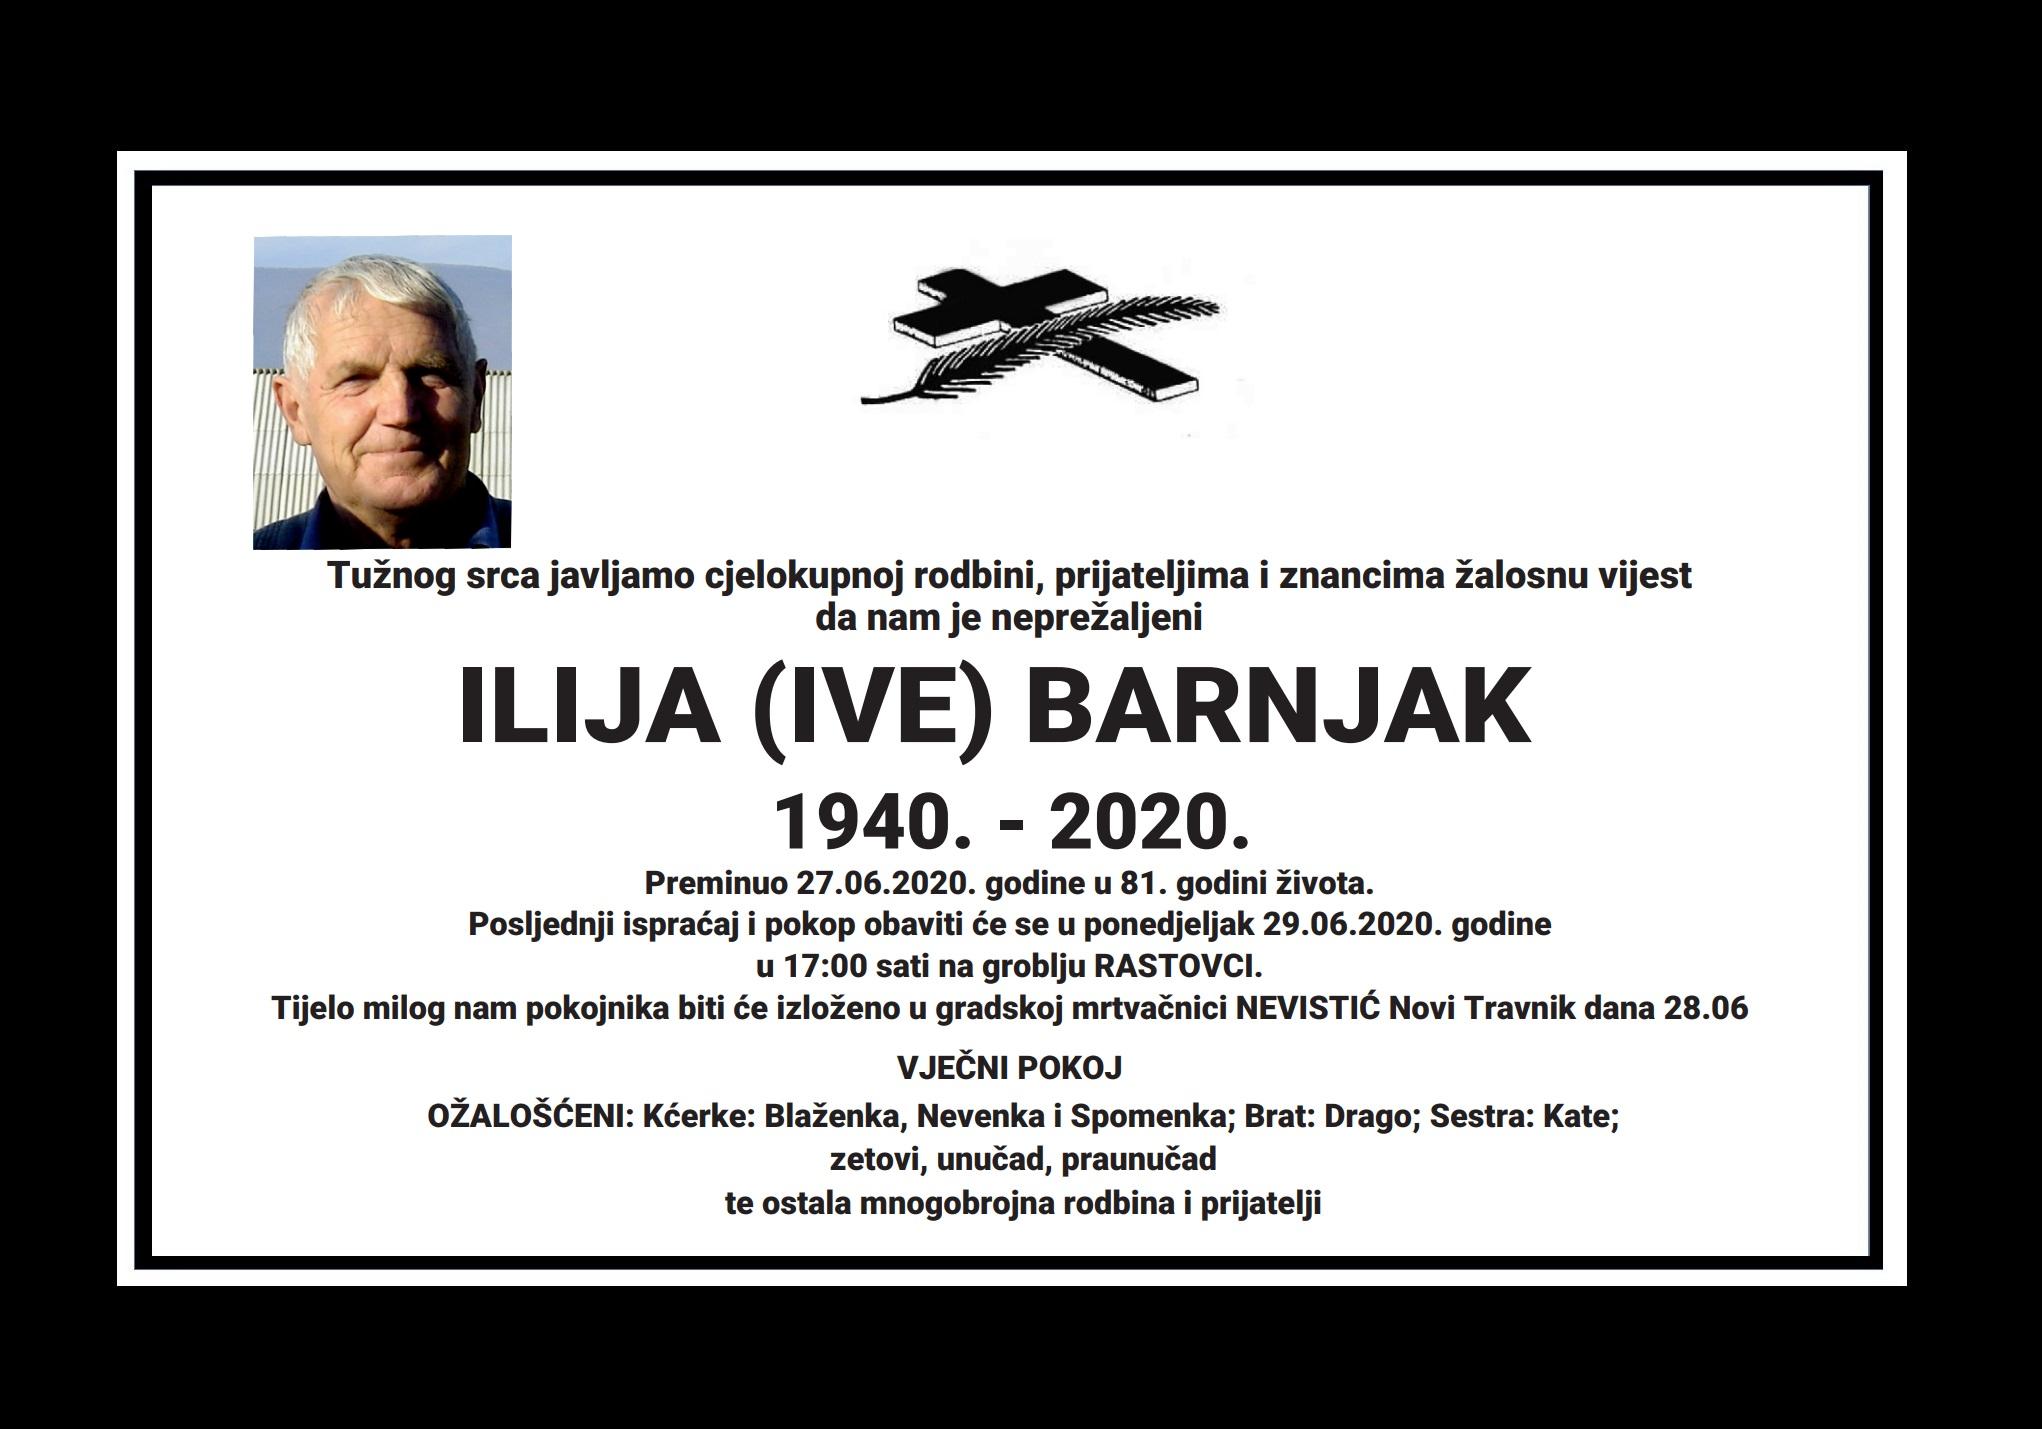 Ilija (Ive) Barnjak